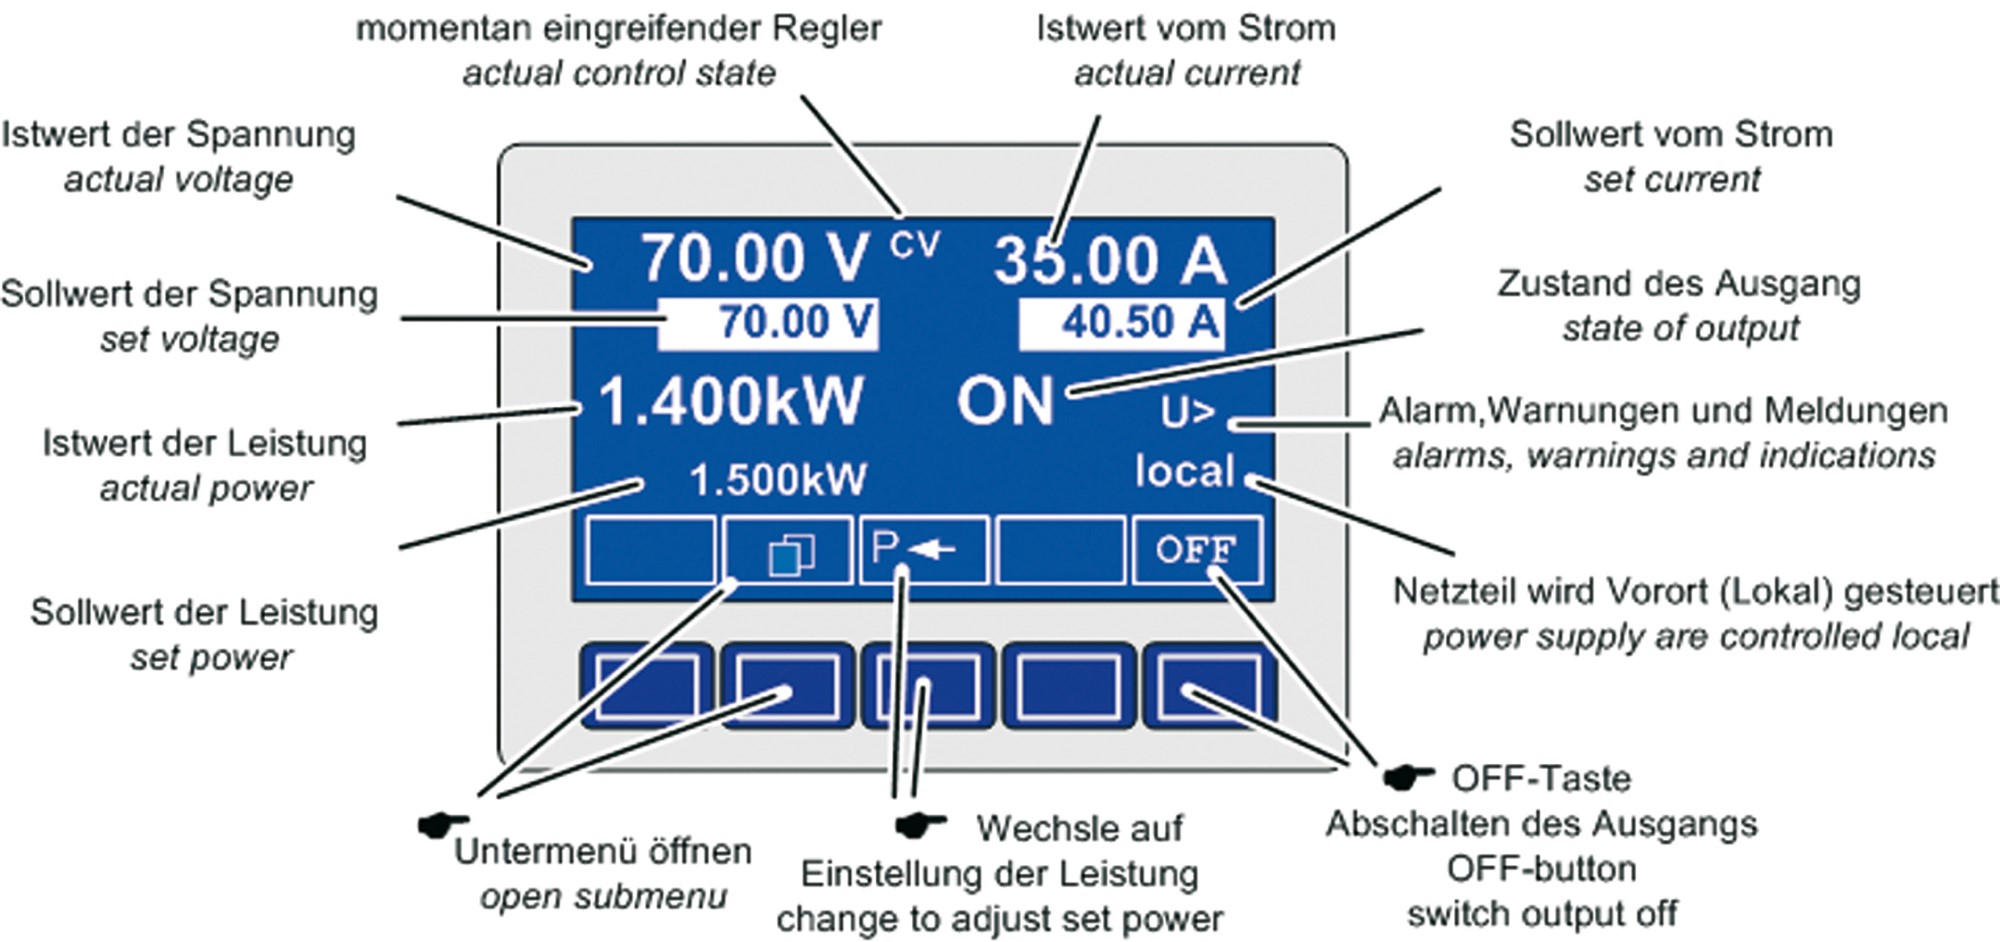 E/PSI 8000-DT Laboratory Power Supply 320-1500 W - EPS